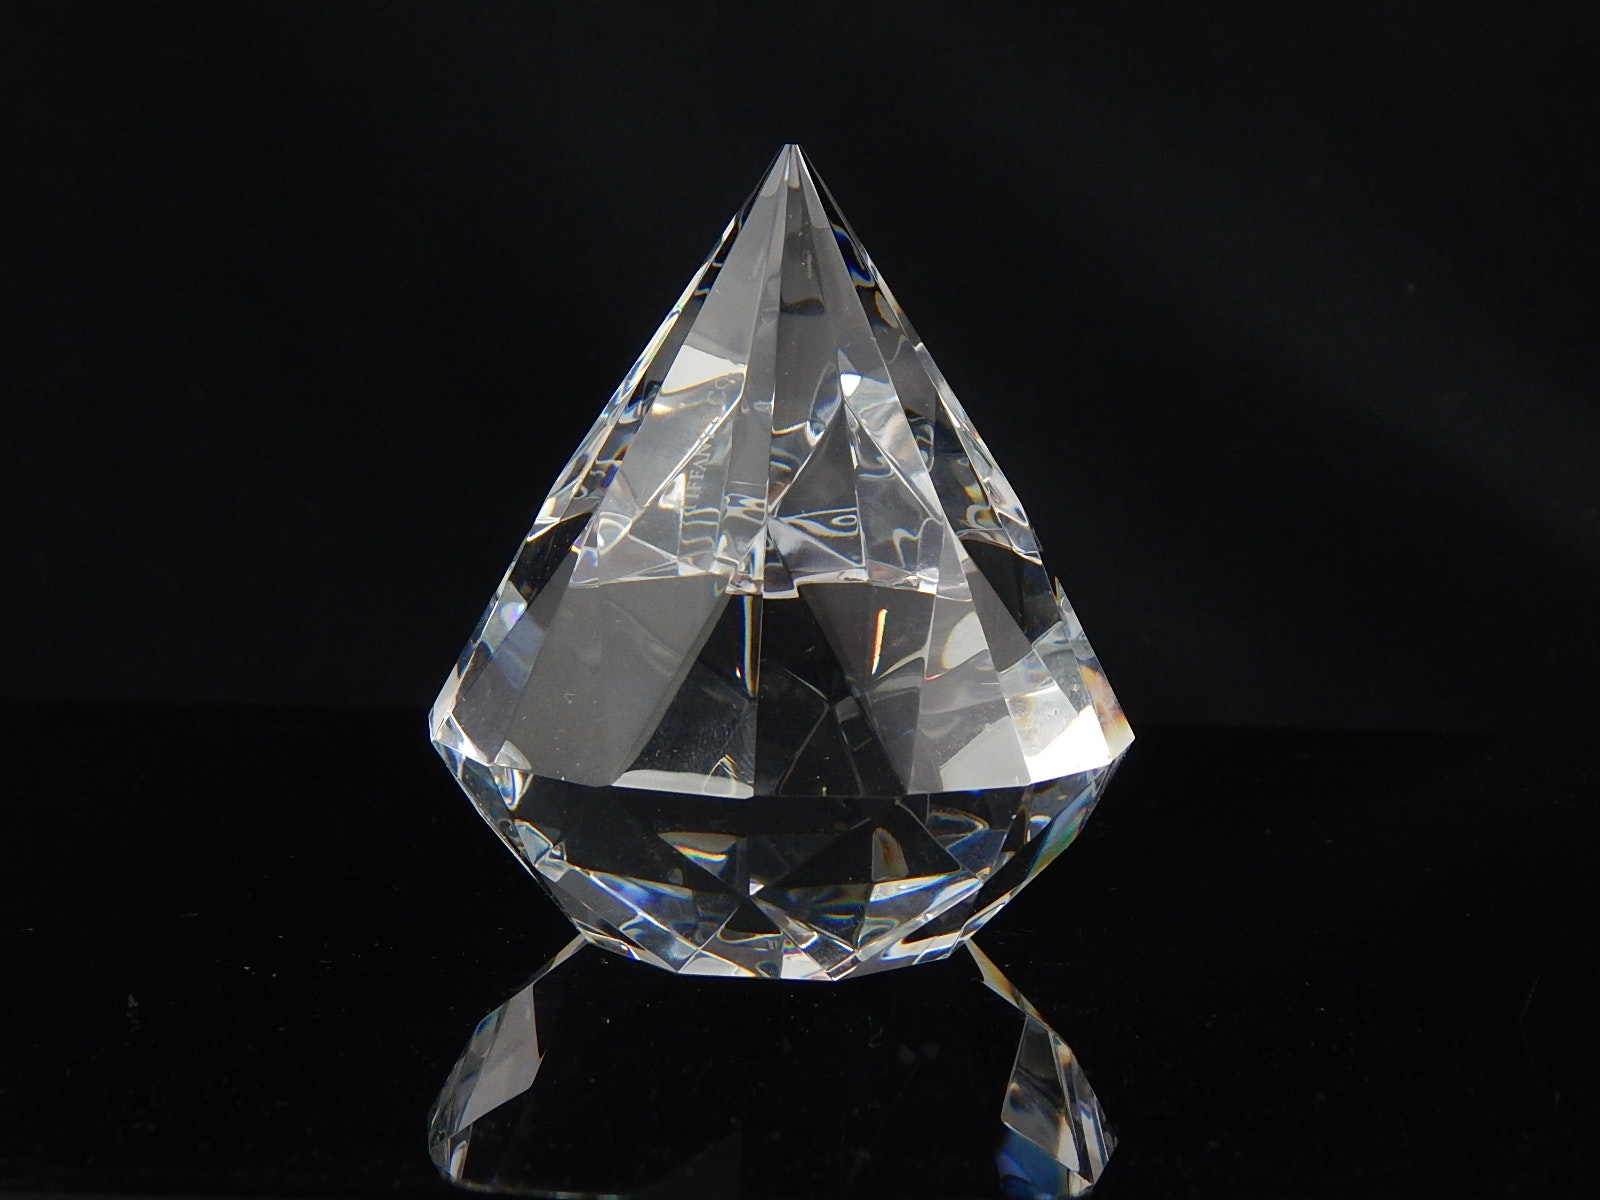 diamond paper weight Engraved pyramid paperweight $4700 diamond paperweights diamond  paperweights $7000 sports crystal paperweights sports crystal  paperweights.